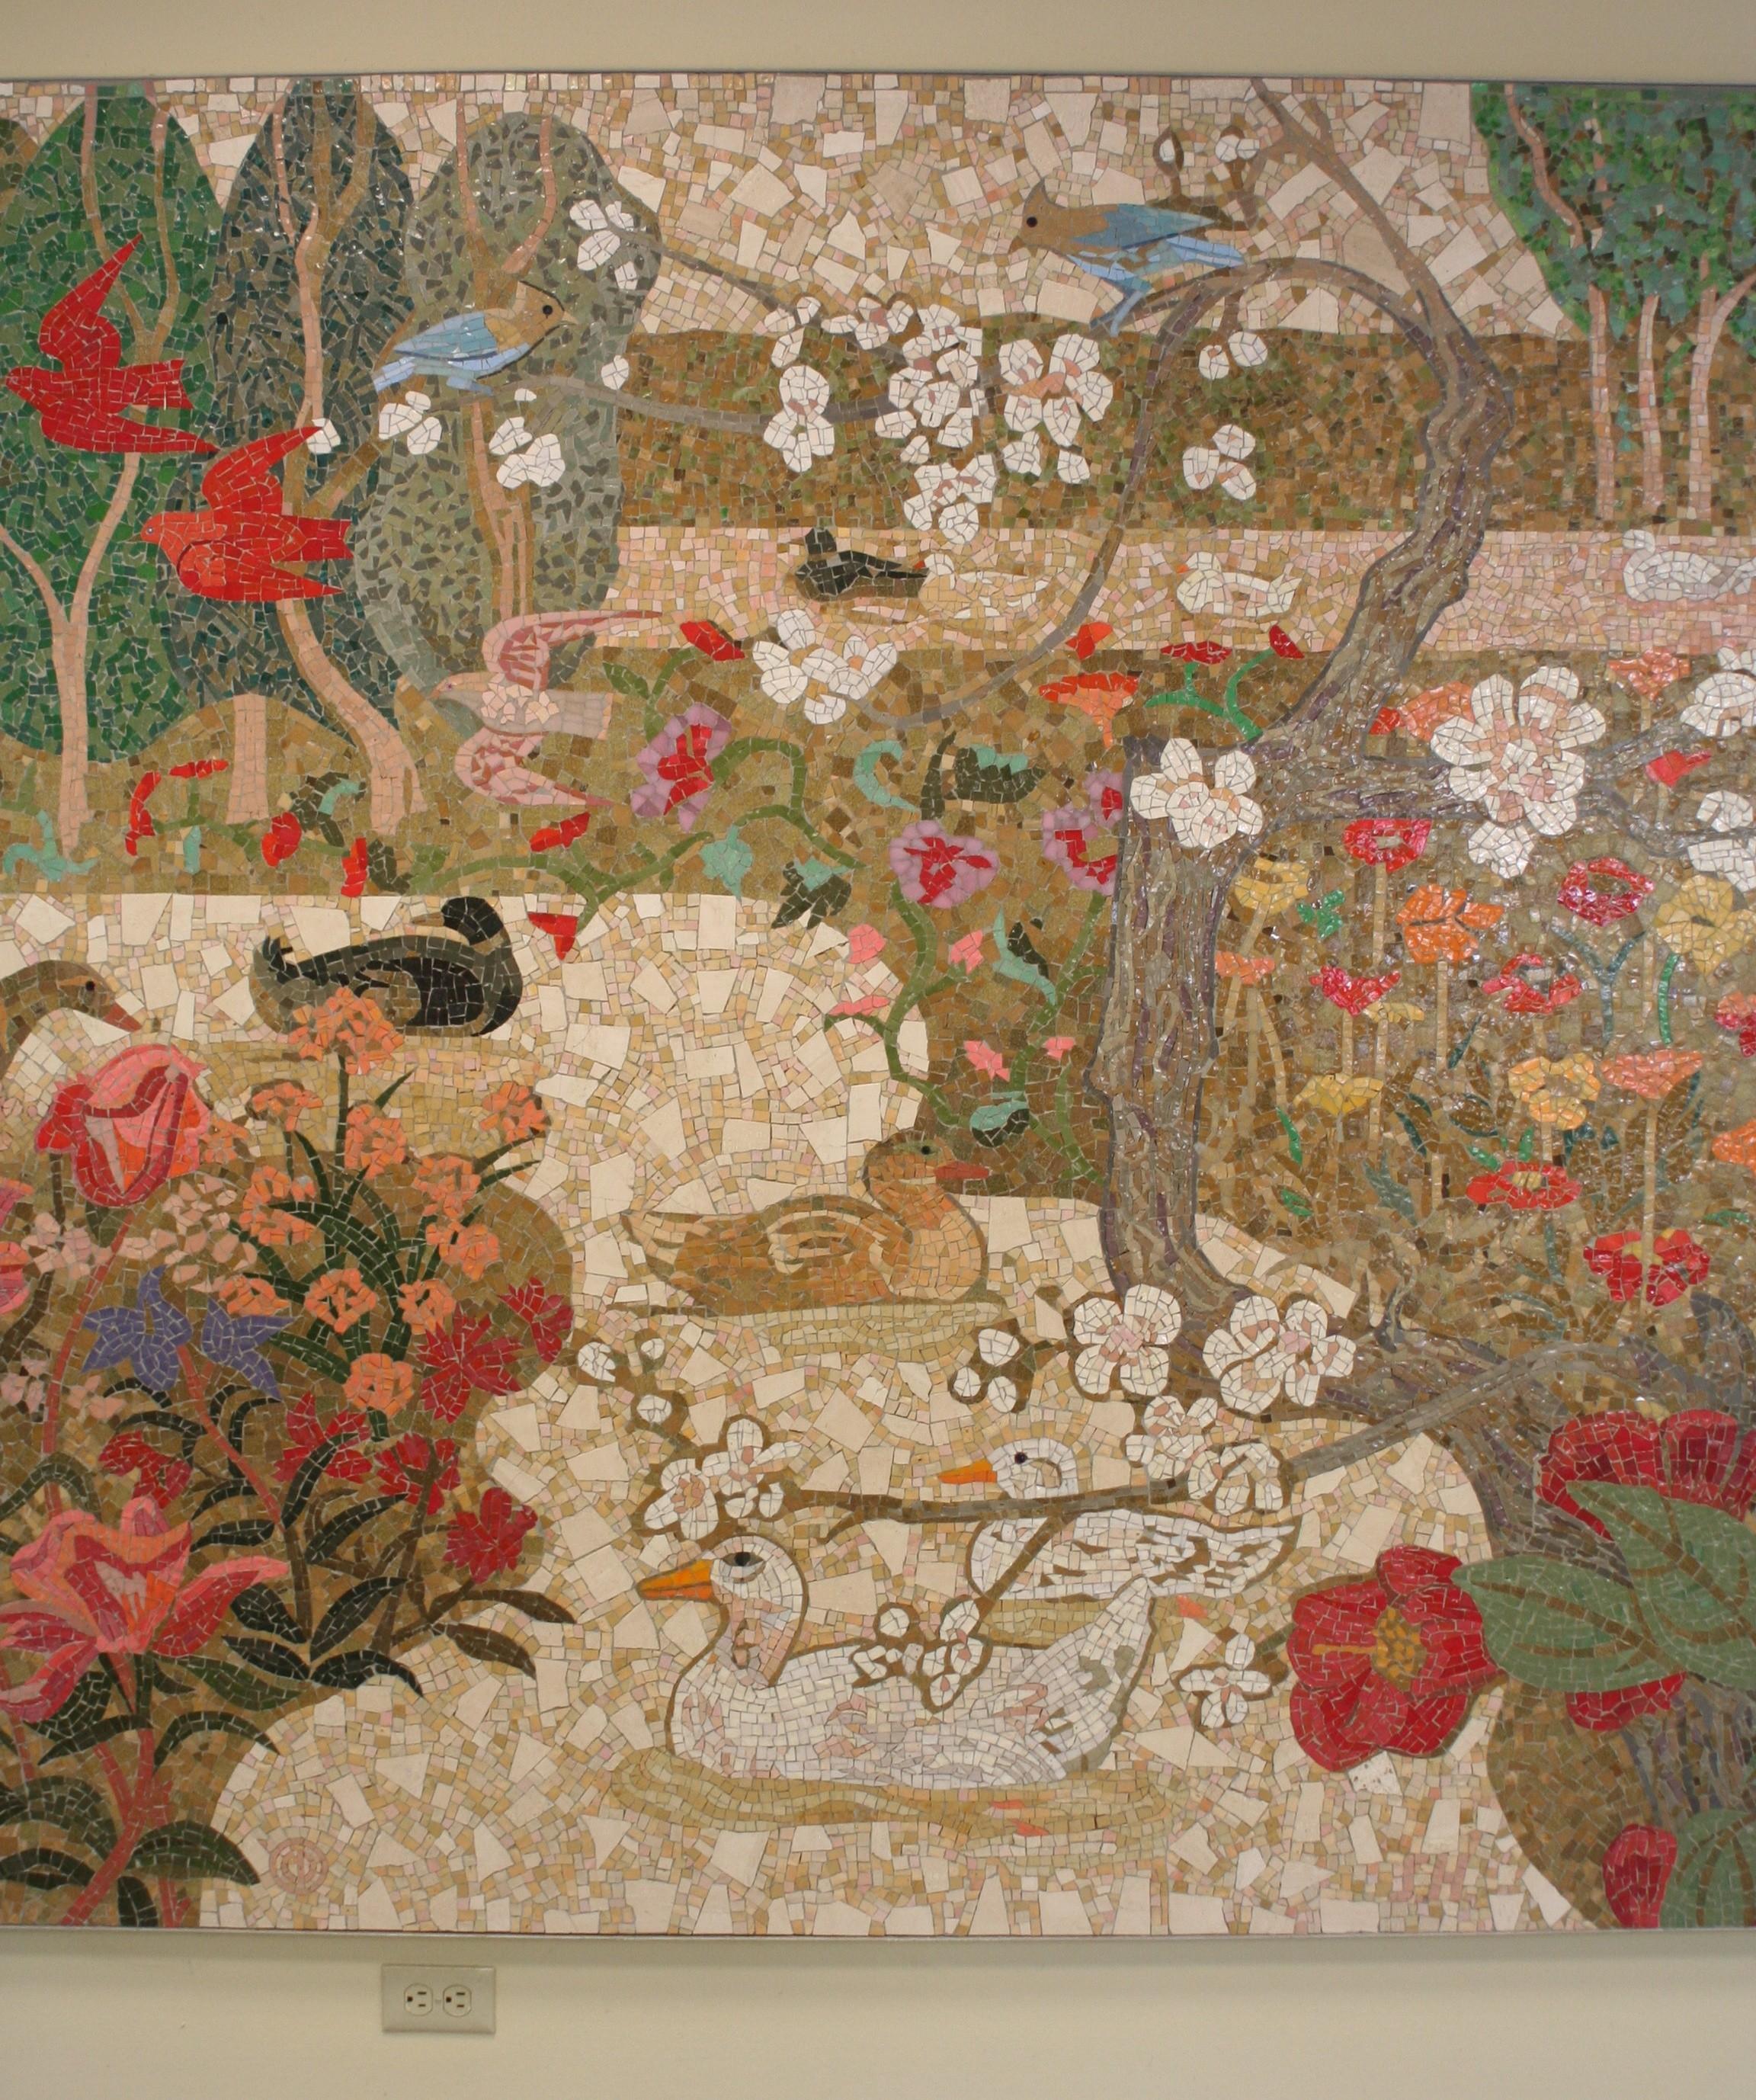 Denis O'Connor, Home Savings, La Canada-Flintridge mosaic, 1990